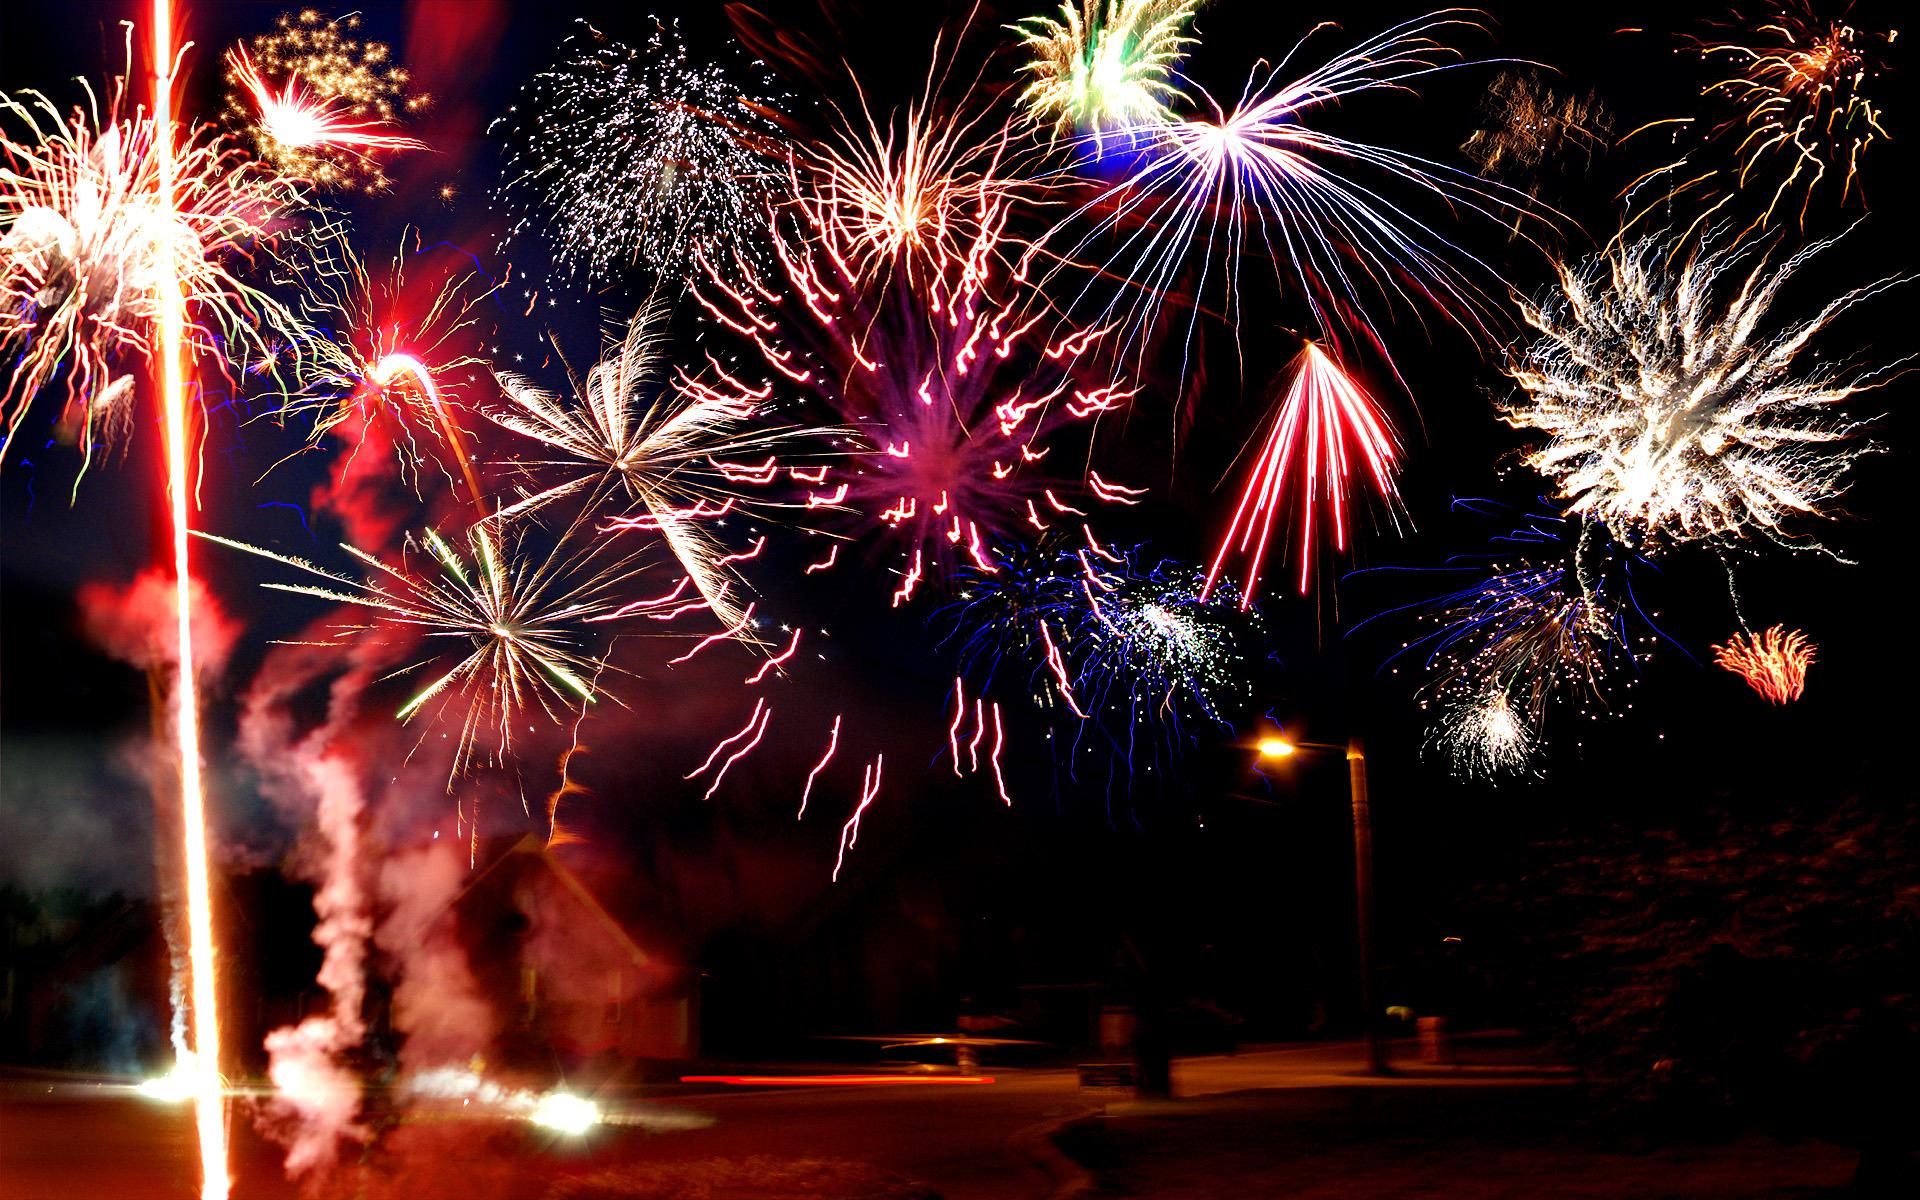 fireworks-photography-hd-wallpaper-1920x1200-283